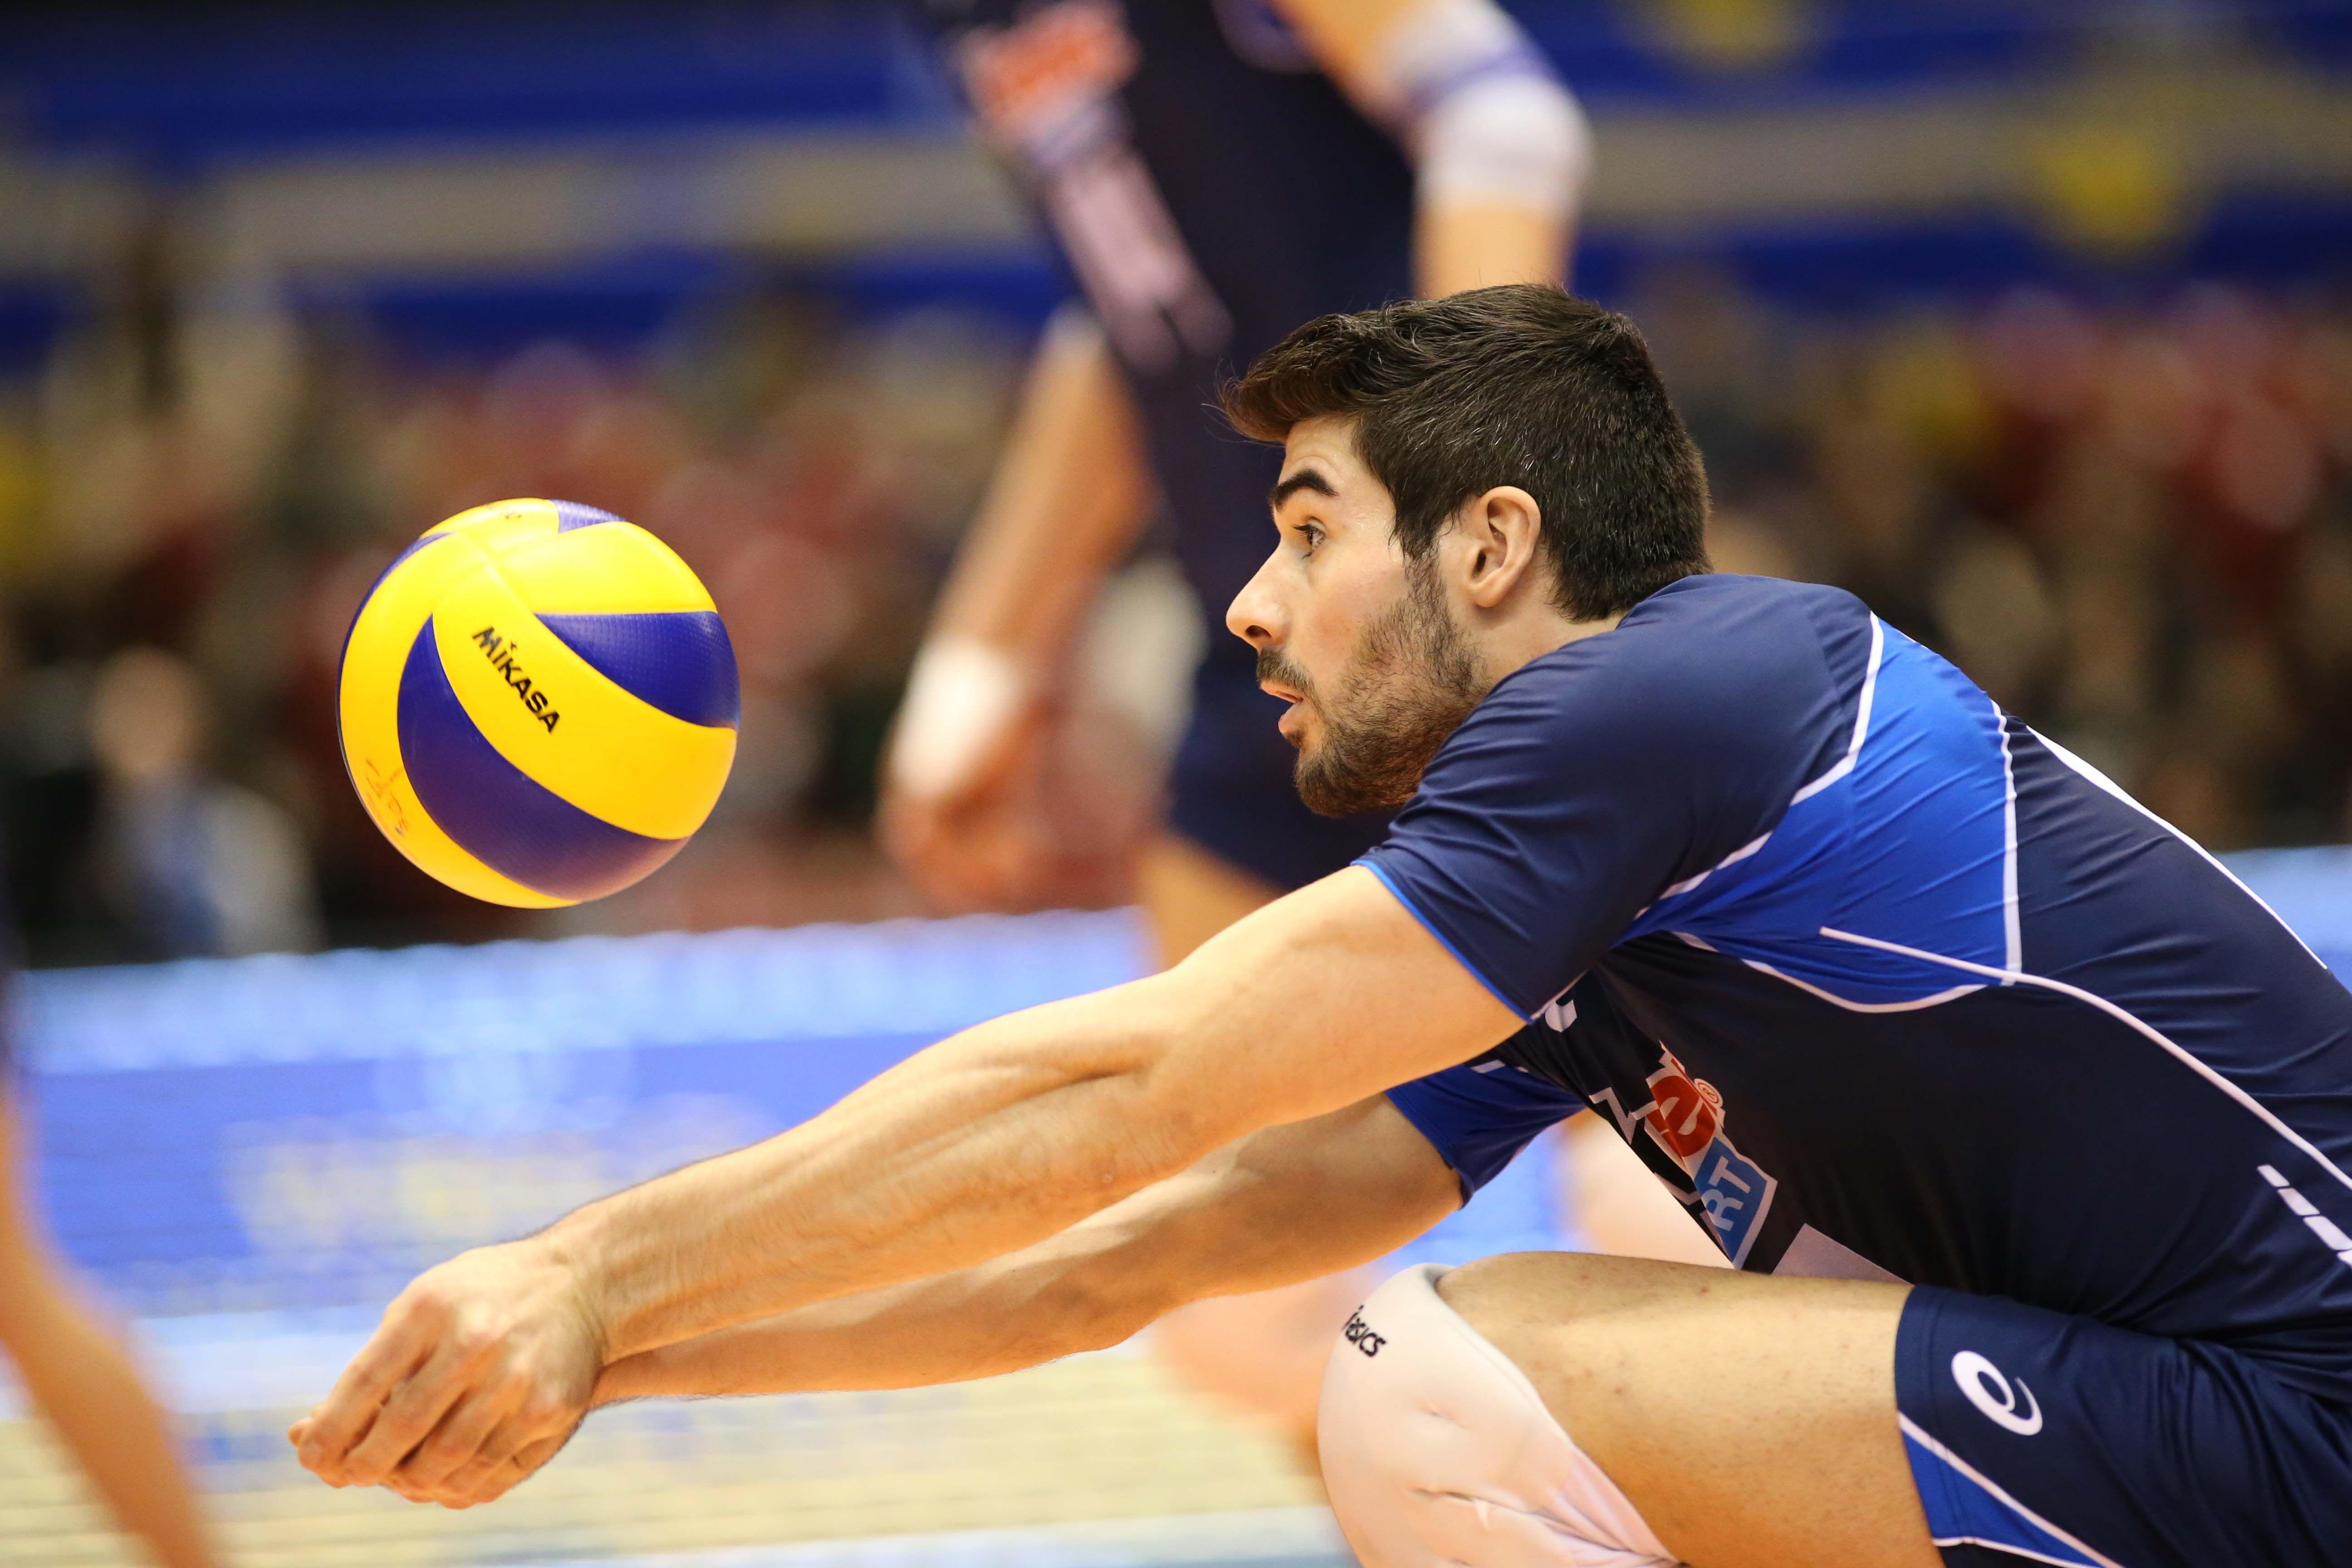 Sport Wallpaper Volleyball: Volley Ball Wallpapers